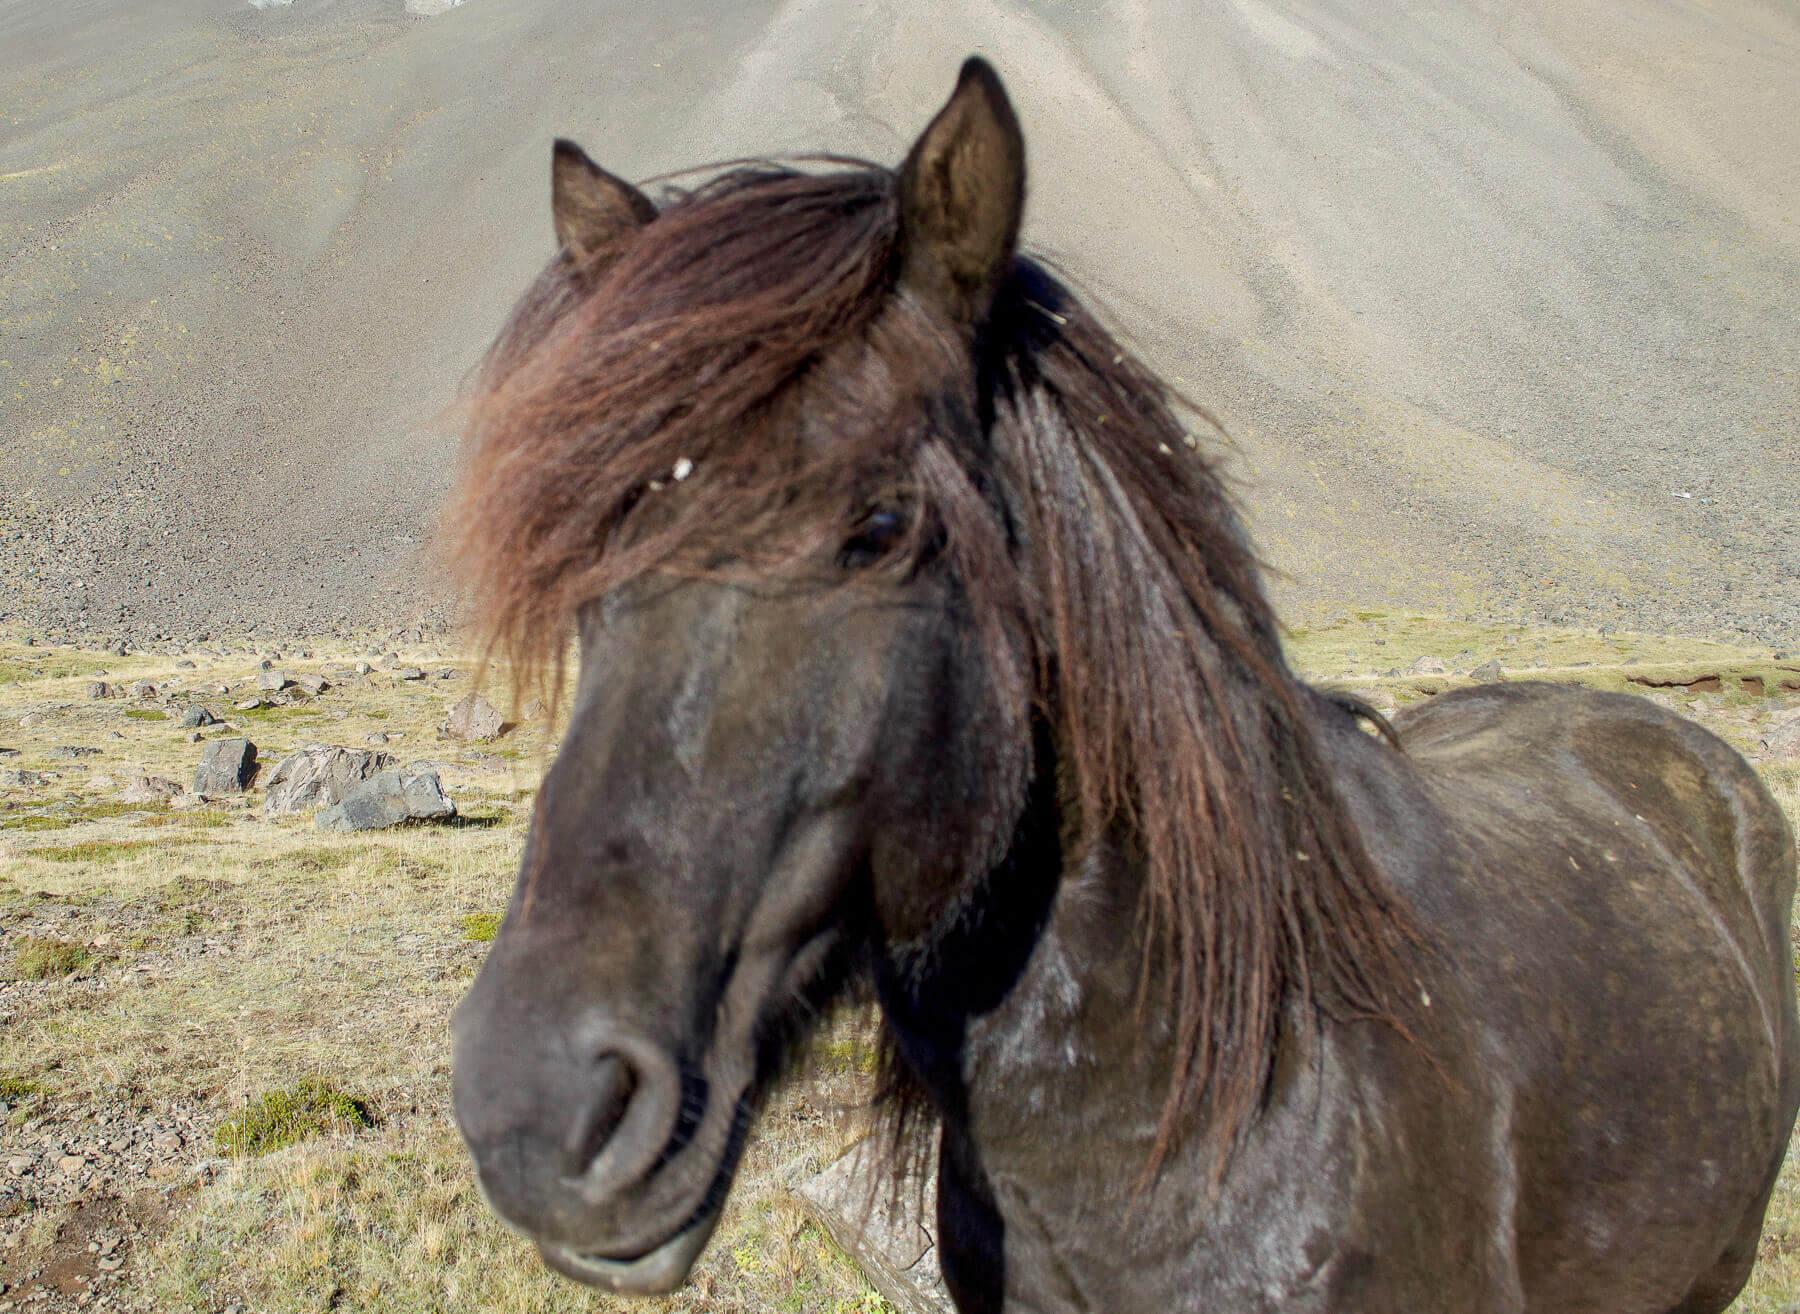 A dirty black Icelandic pony